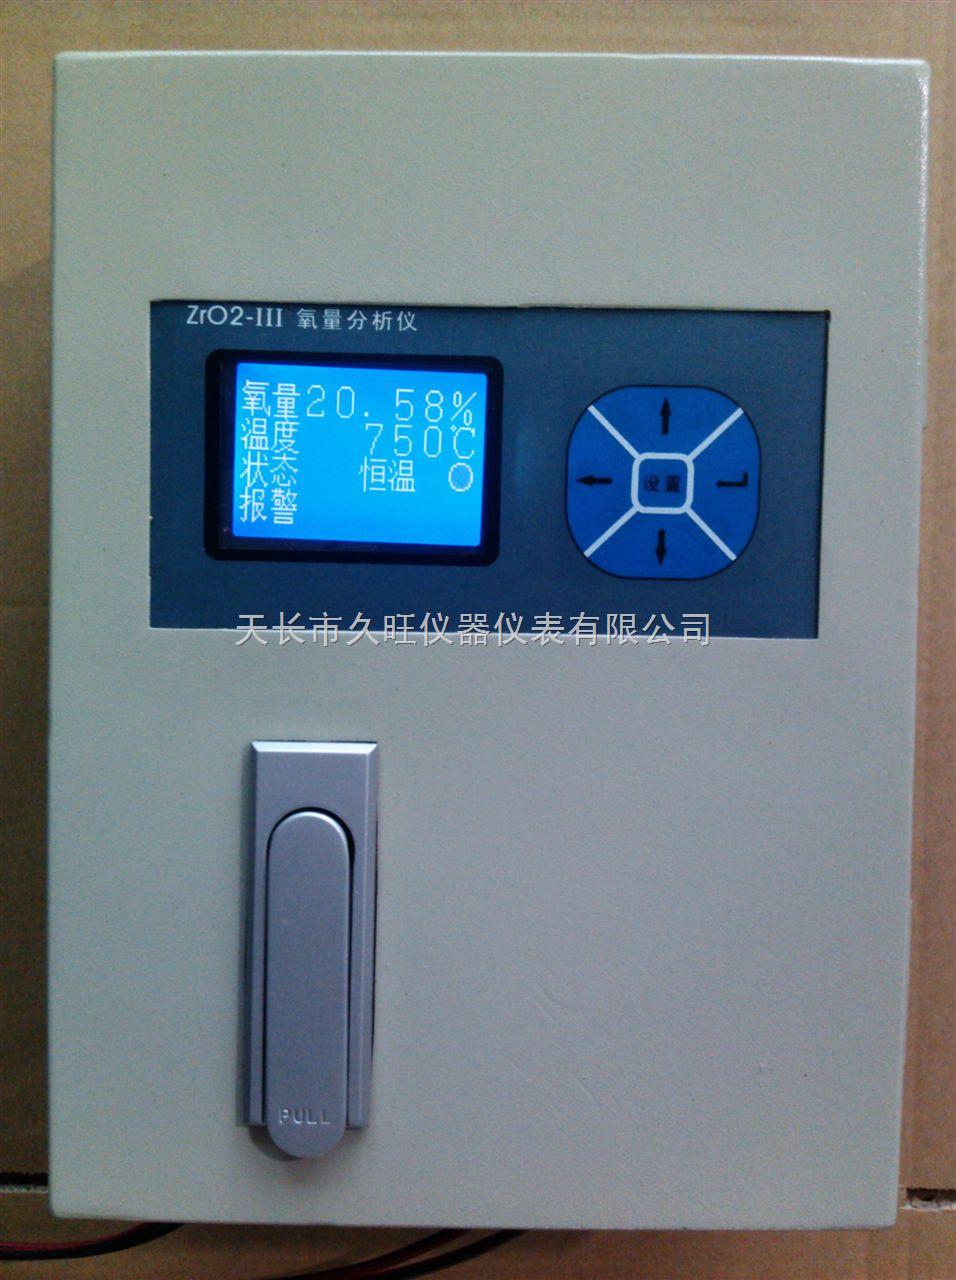 4-20ma标准电流输出与主电路光电